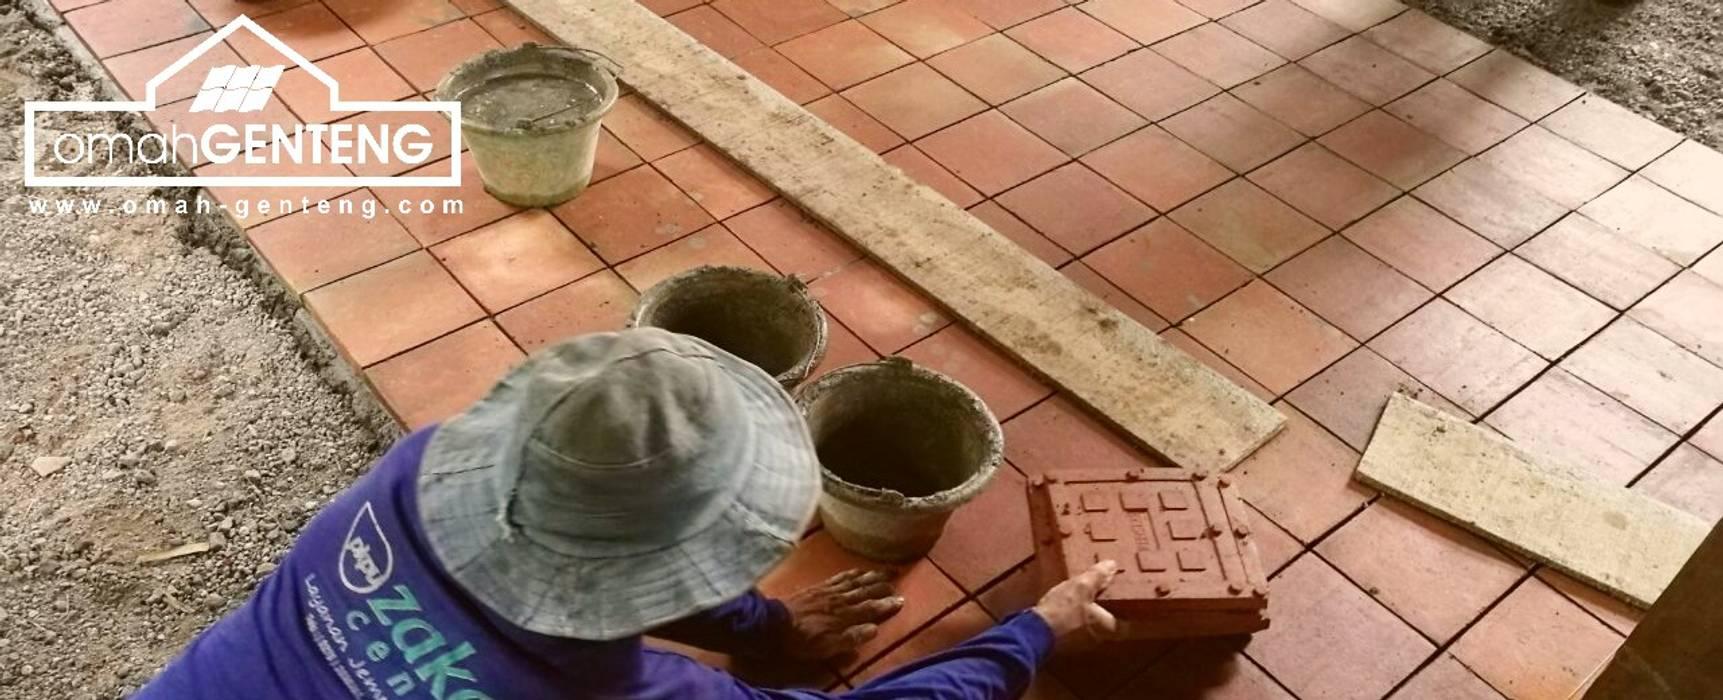 Ubin Terakota Bali - HP/WA: 08122833040 - Omah Genteng Oleh Omah Genteng Country Batu Bata